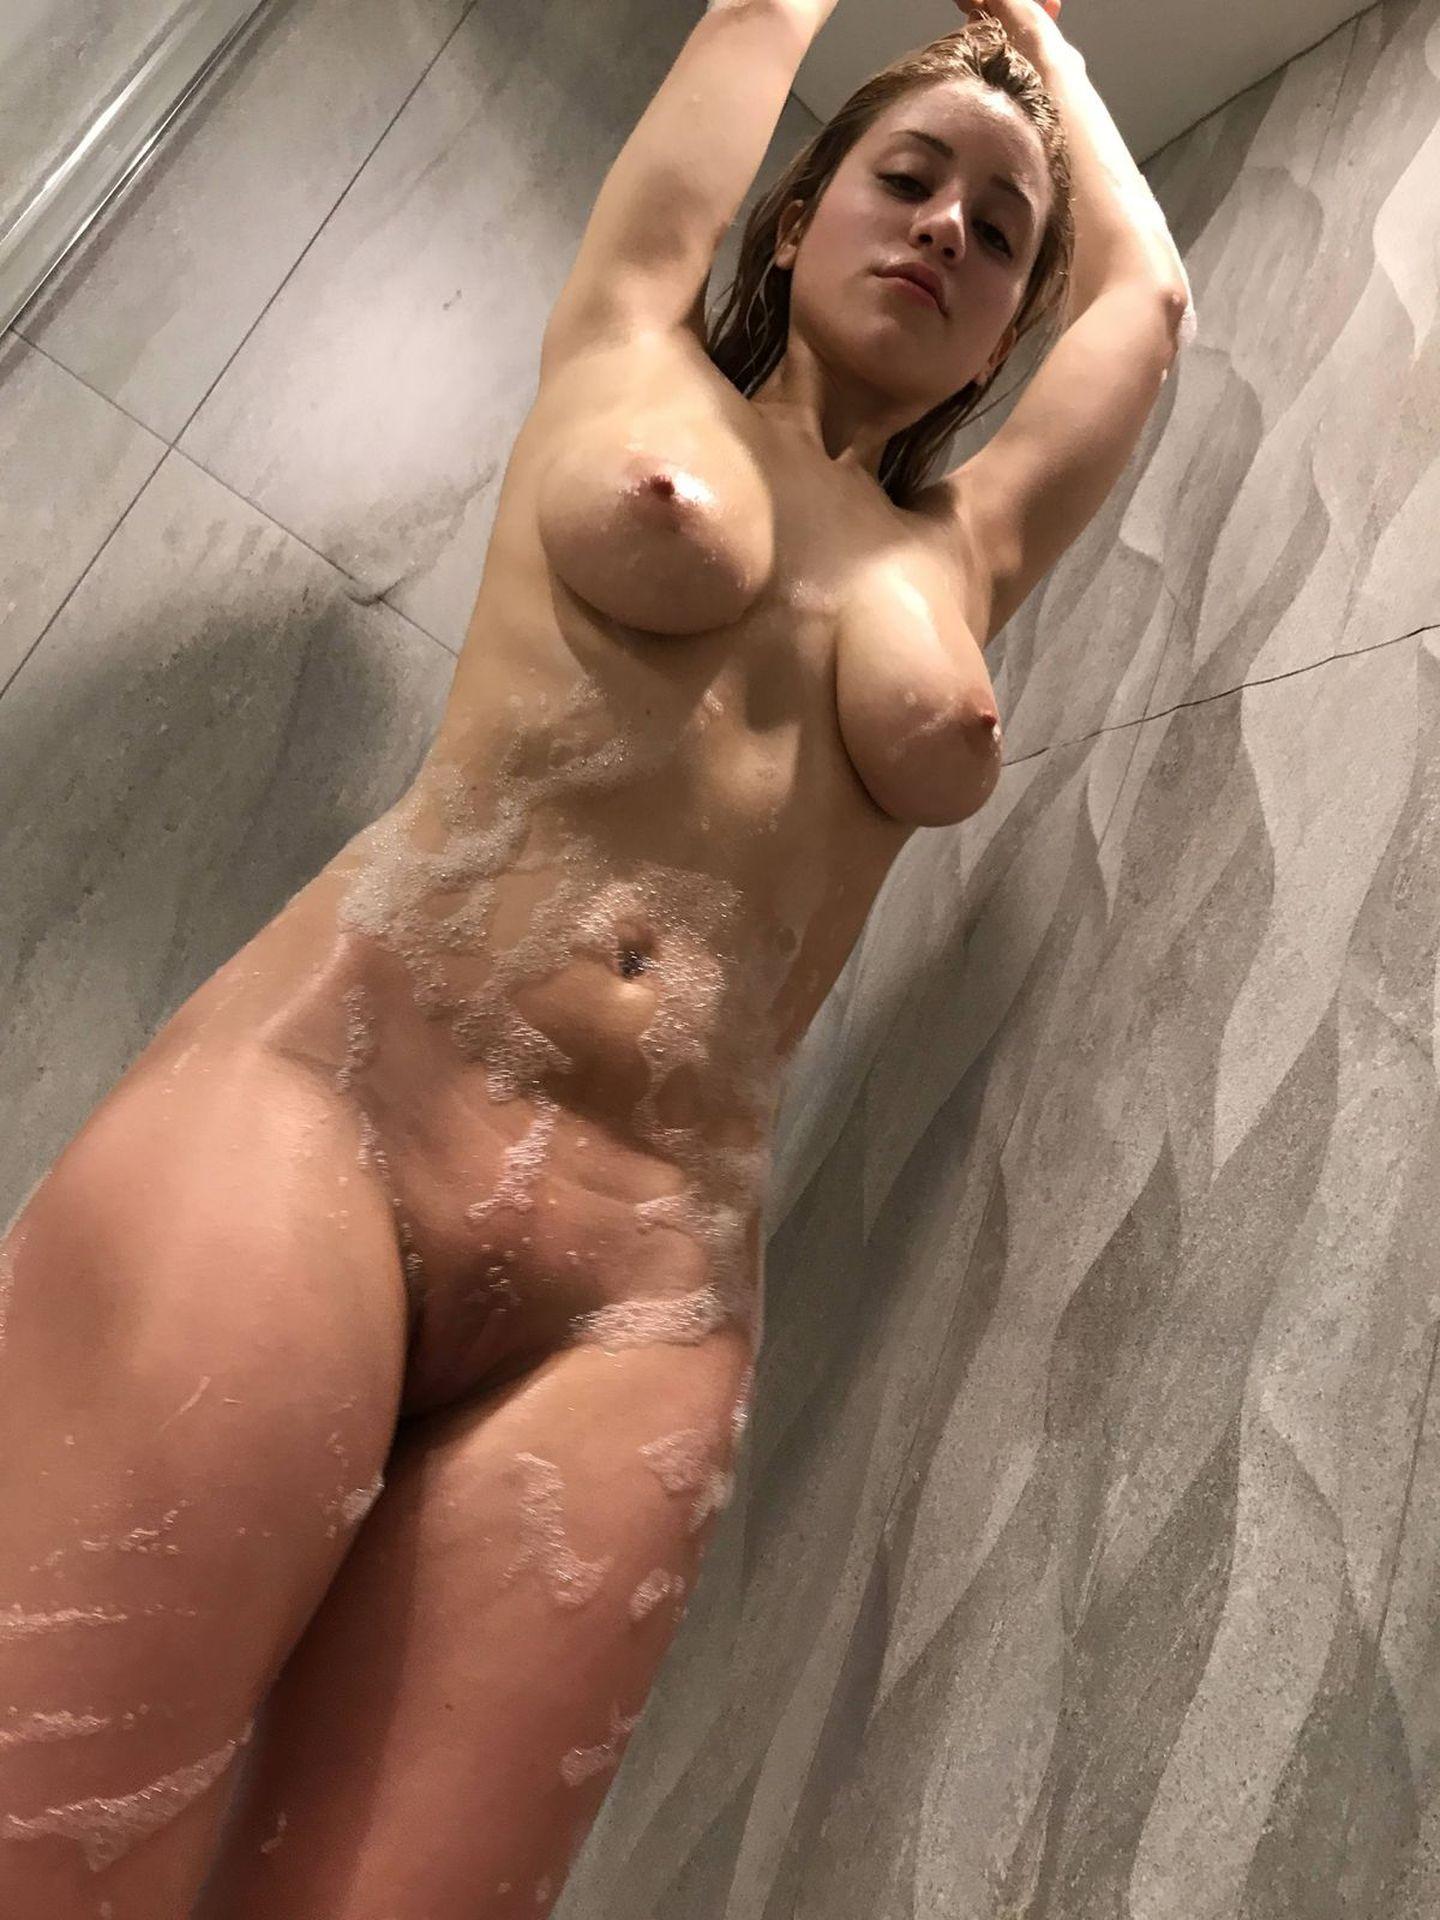 Fucking Porn Pix Painful big cock porn